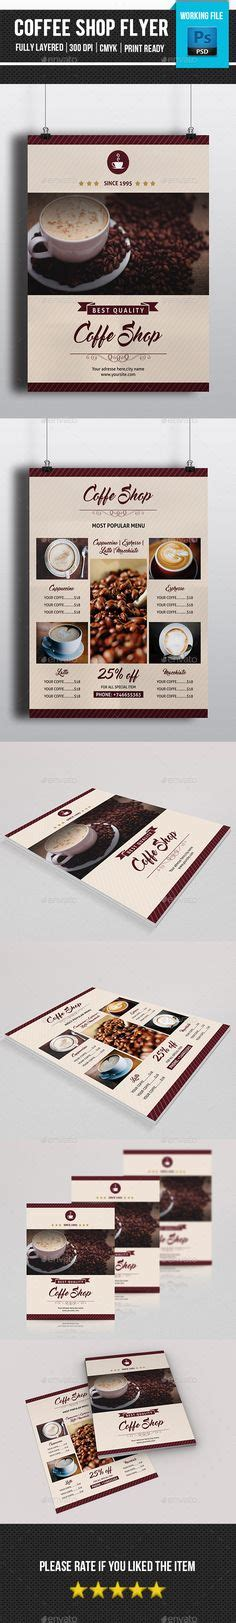 flyer design zürich coffee shop flyer template design download http